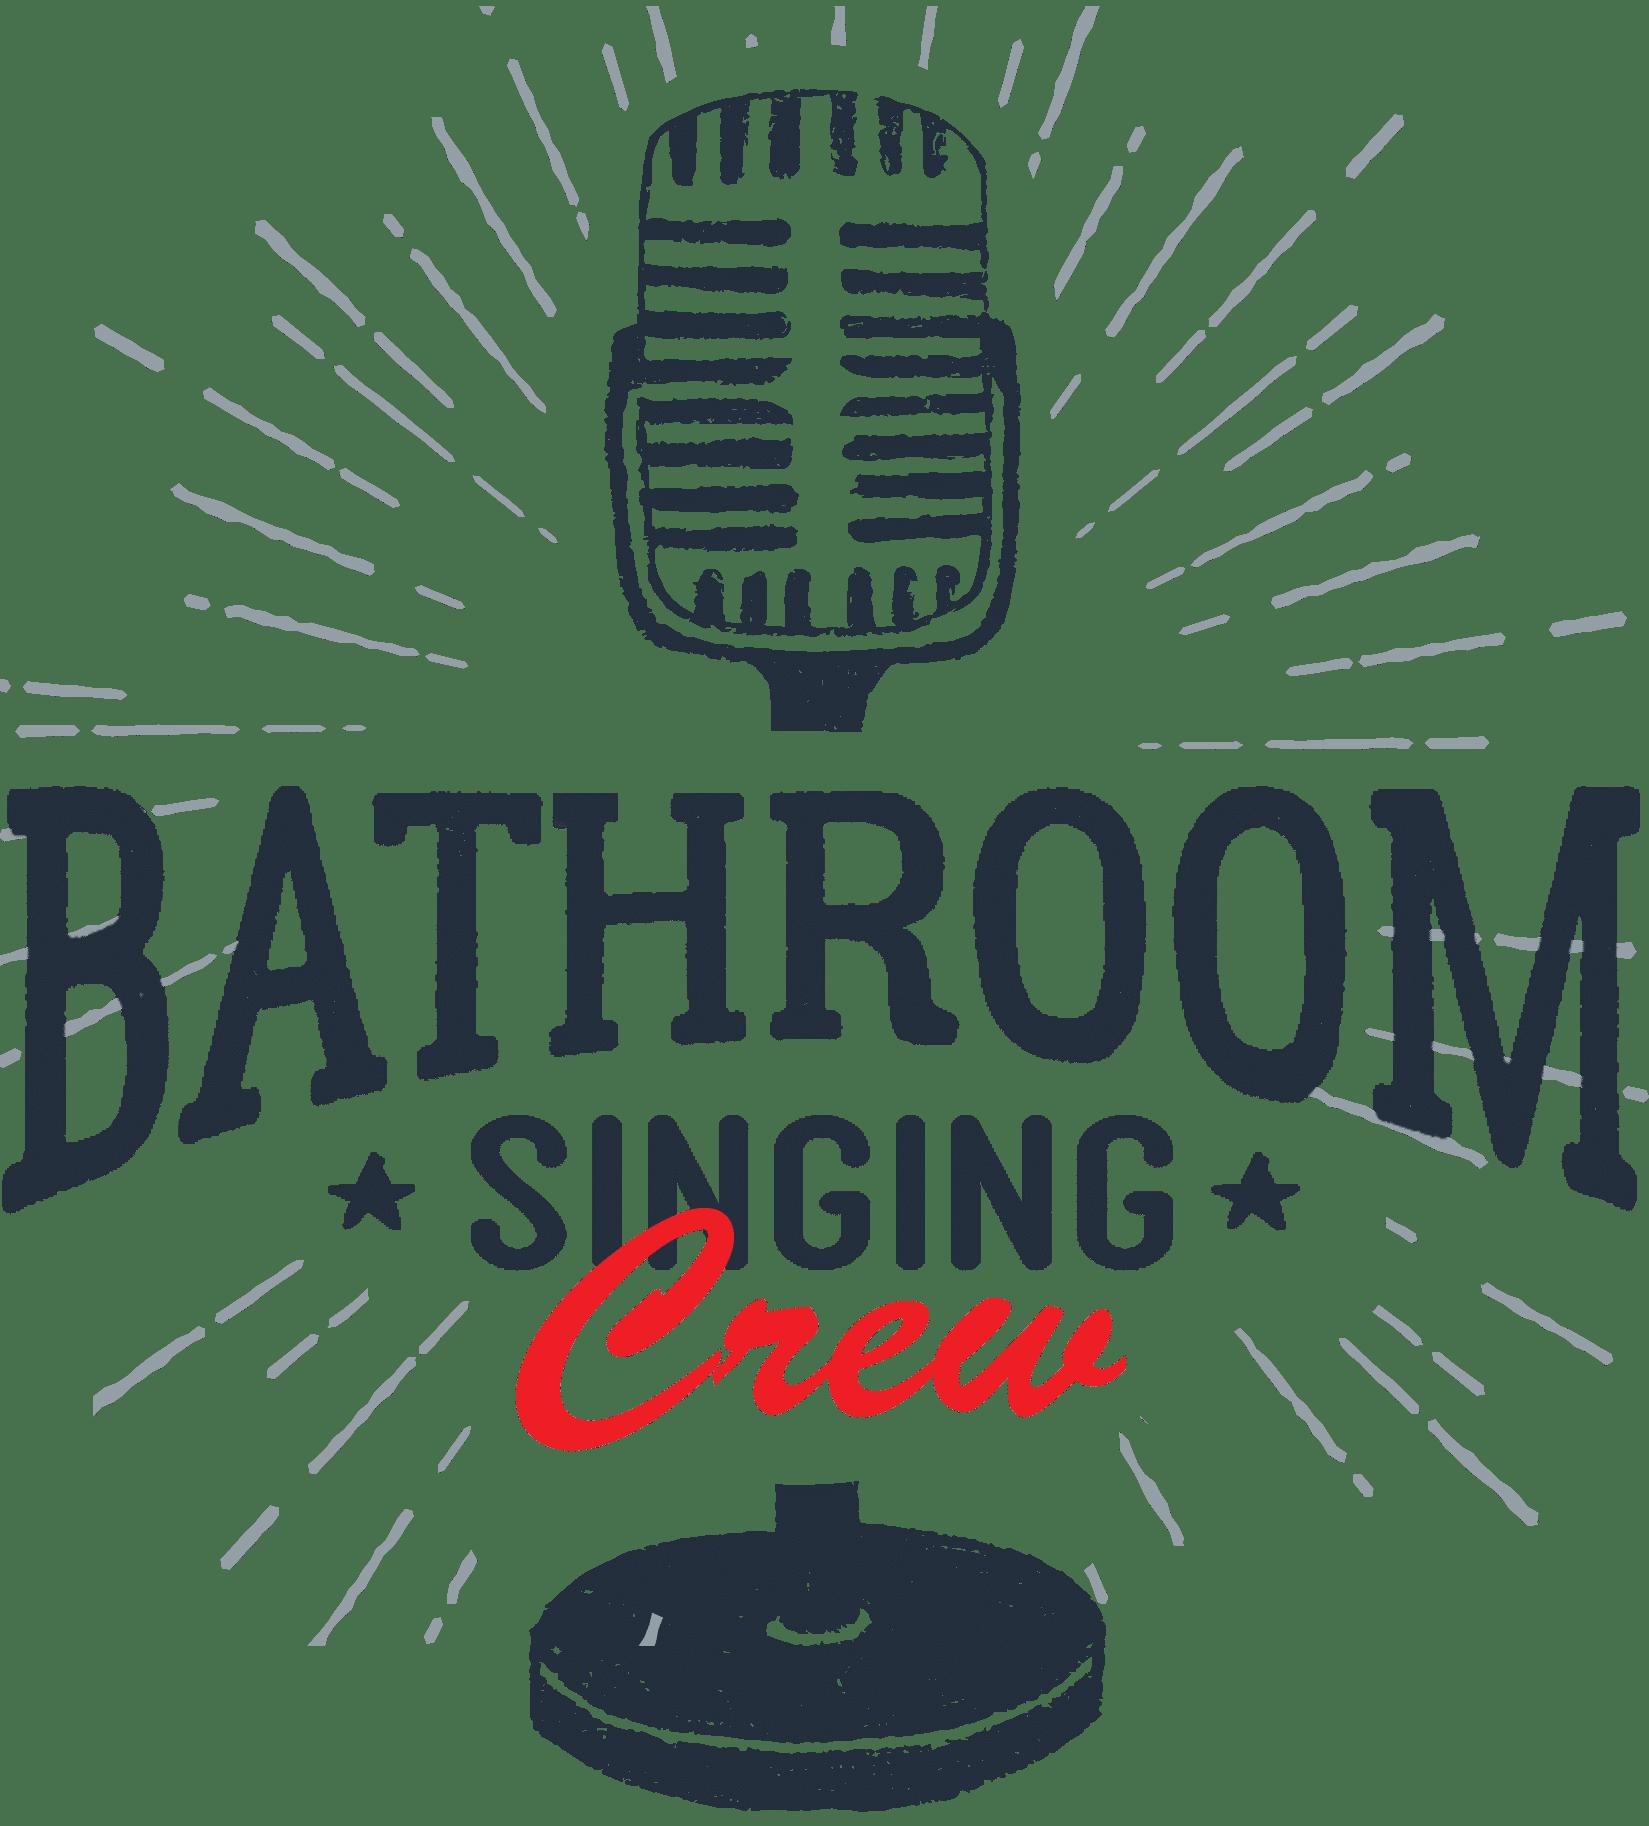 Bathroom Singing Crew